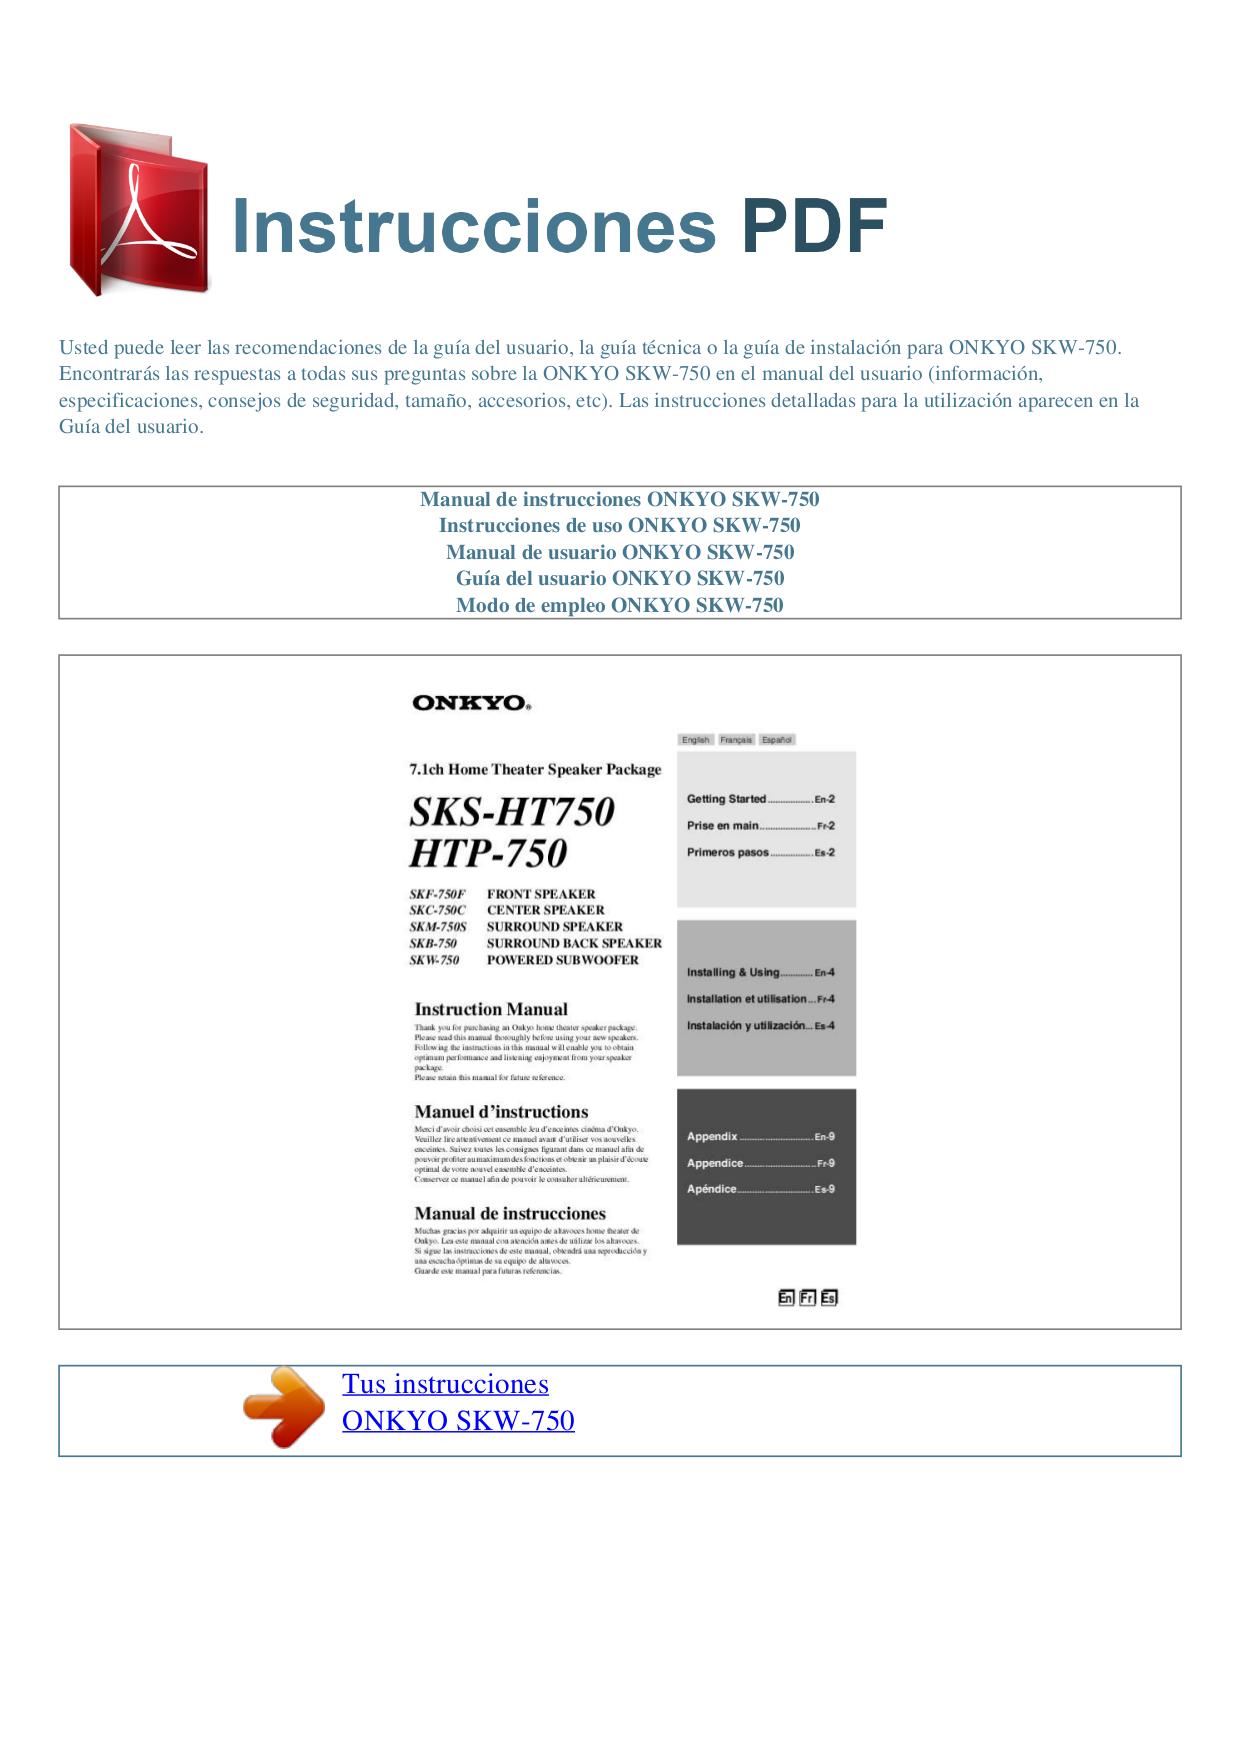 pdf for Onkyo Subwoofer SKW-750 manual